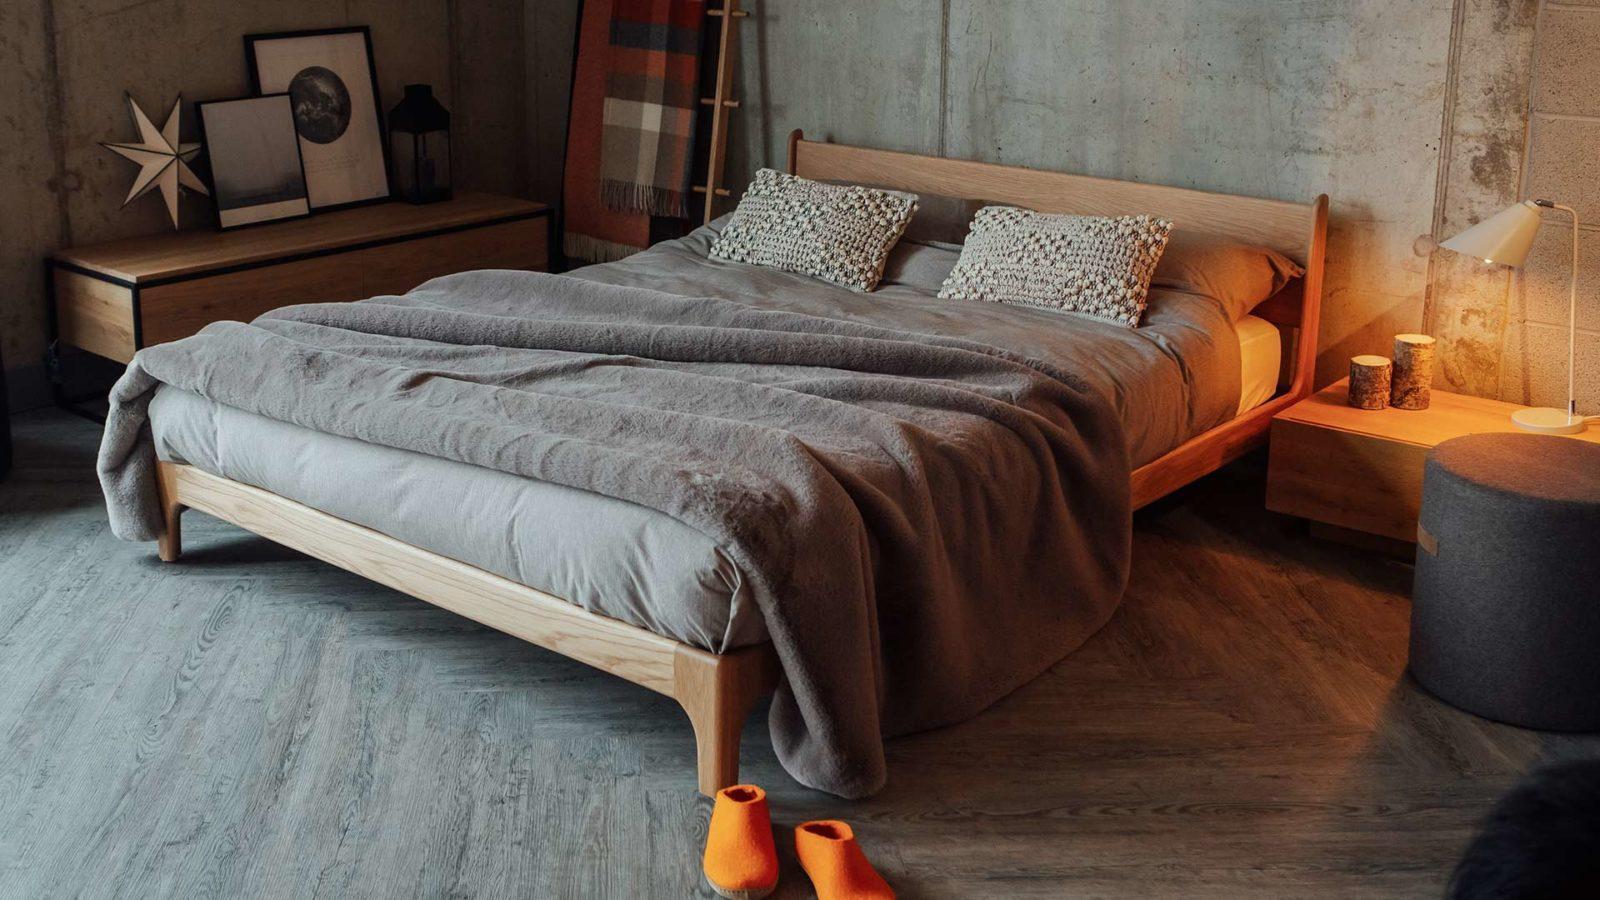 Pimlico-with-cement-grey-faux-fur-bedspread